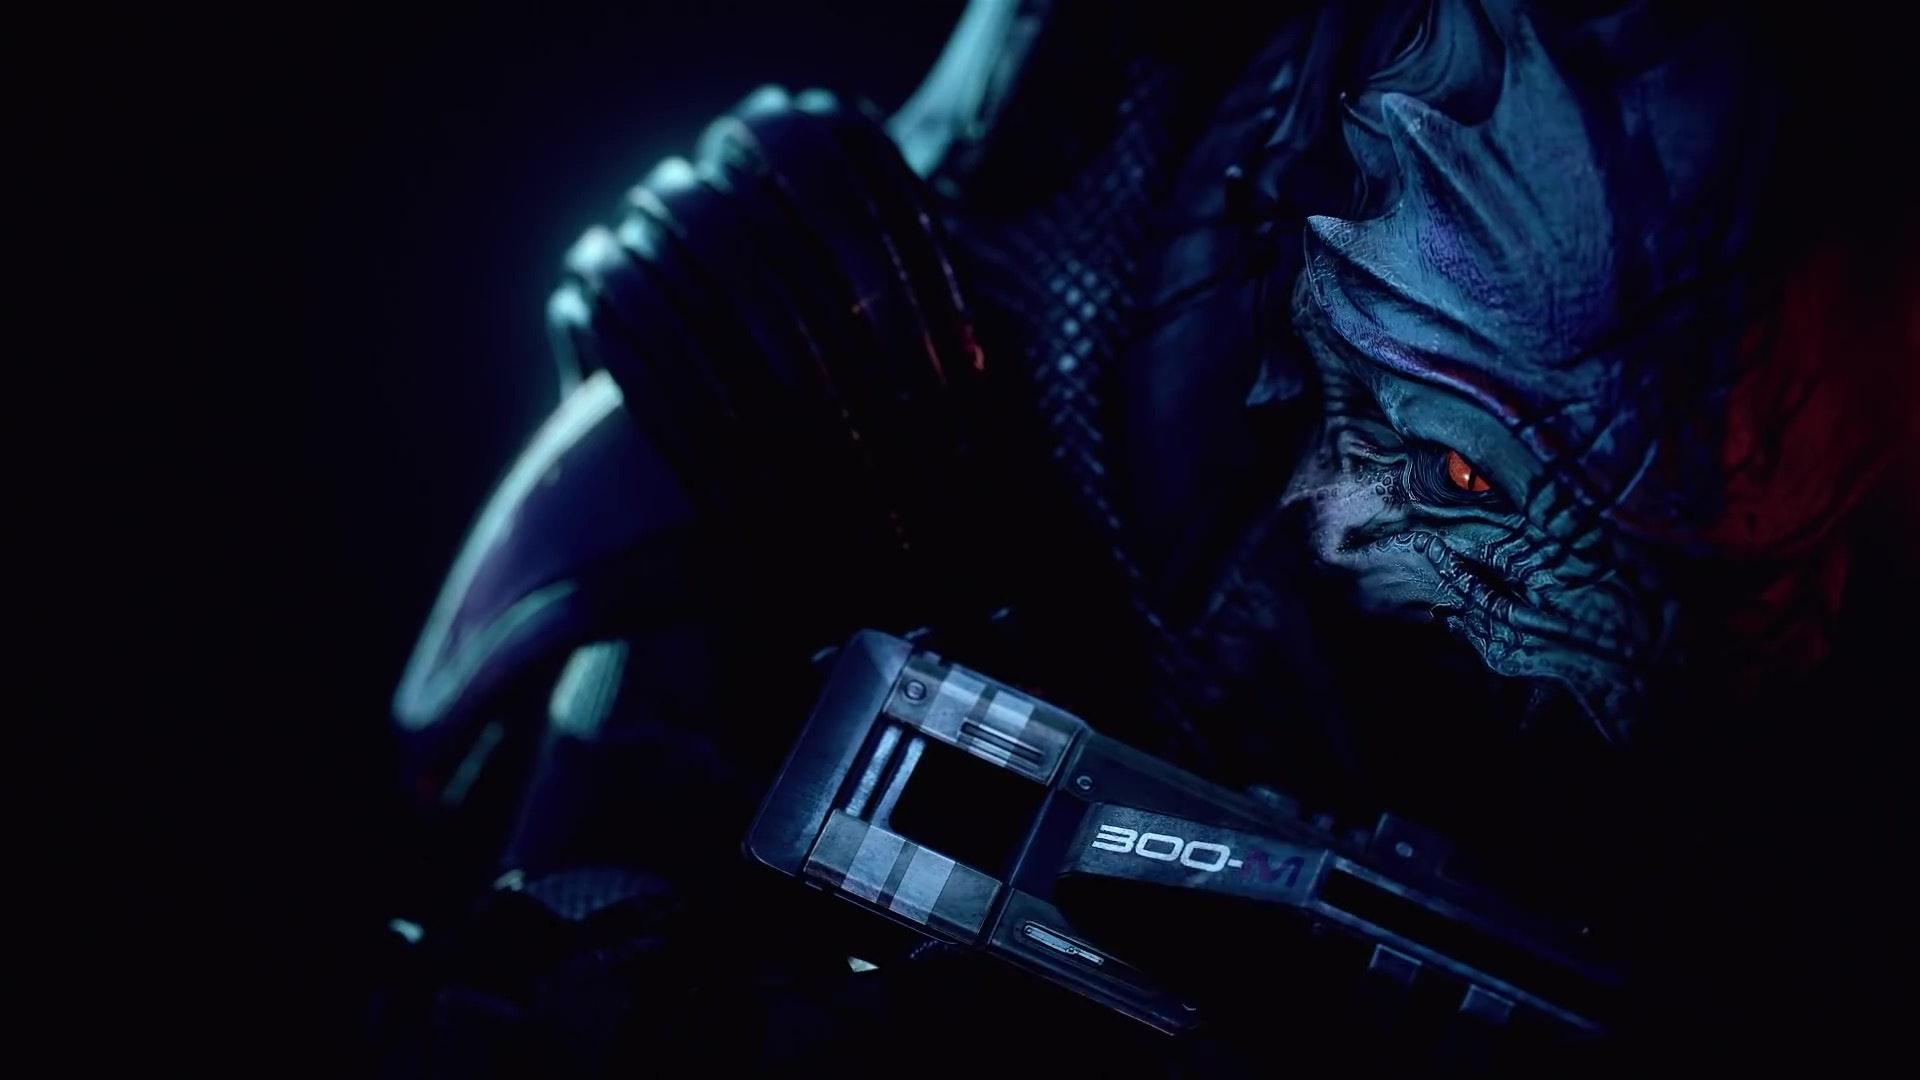 Mass Effect Legenday edition image